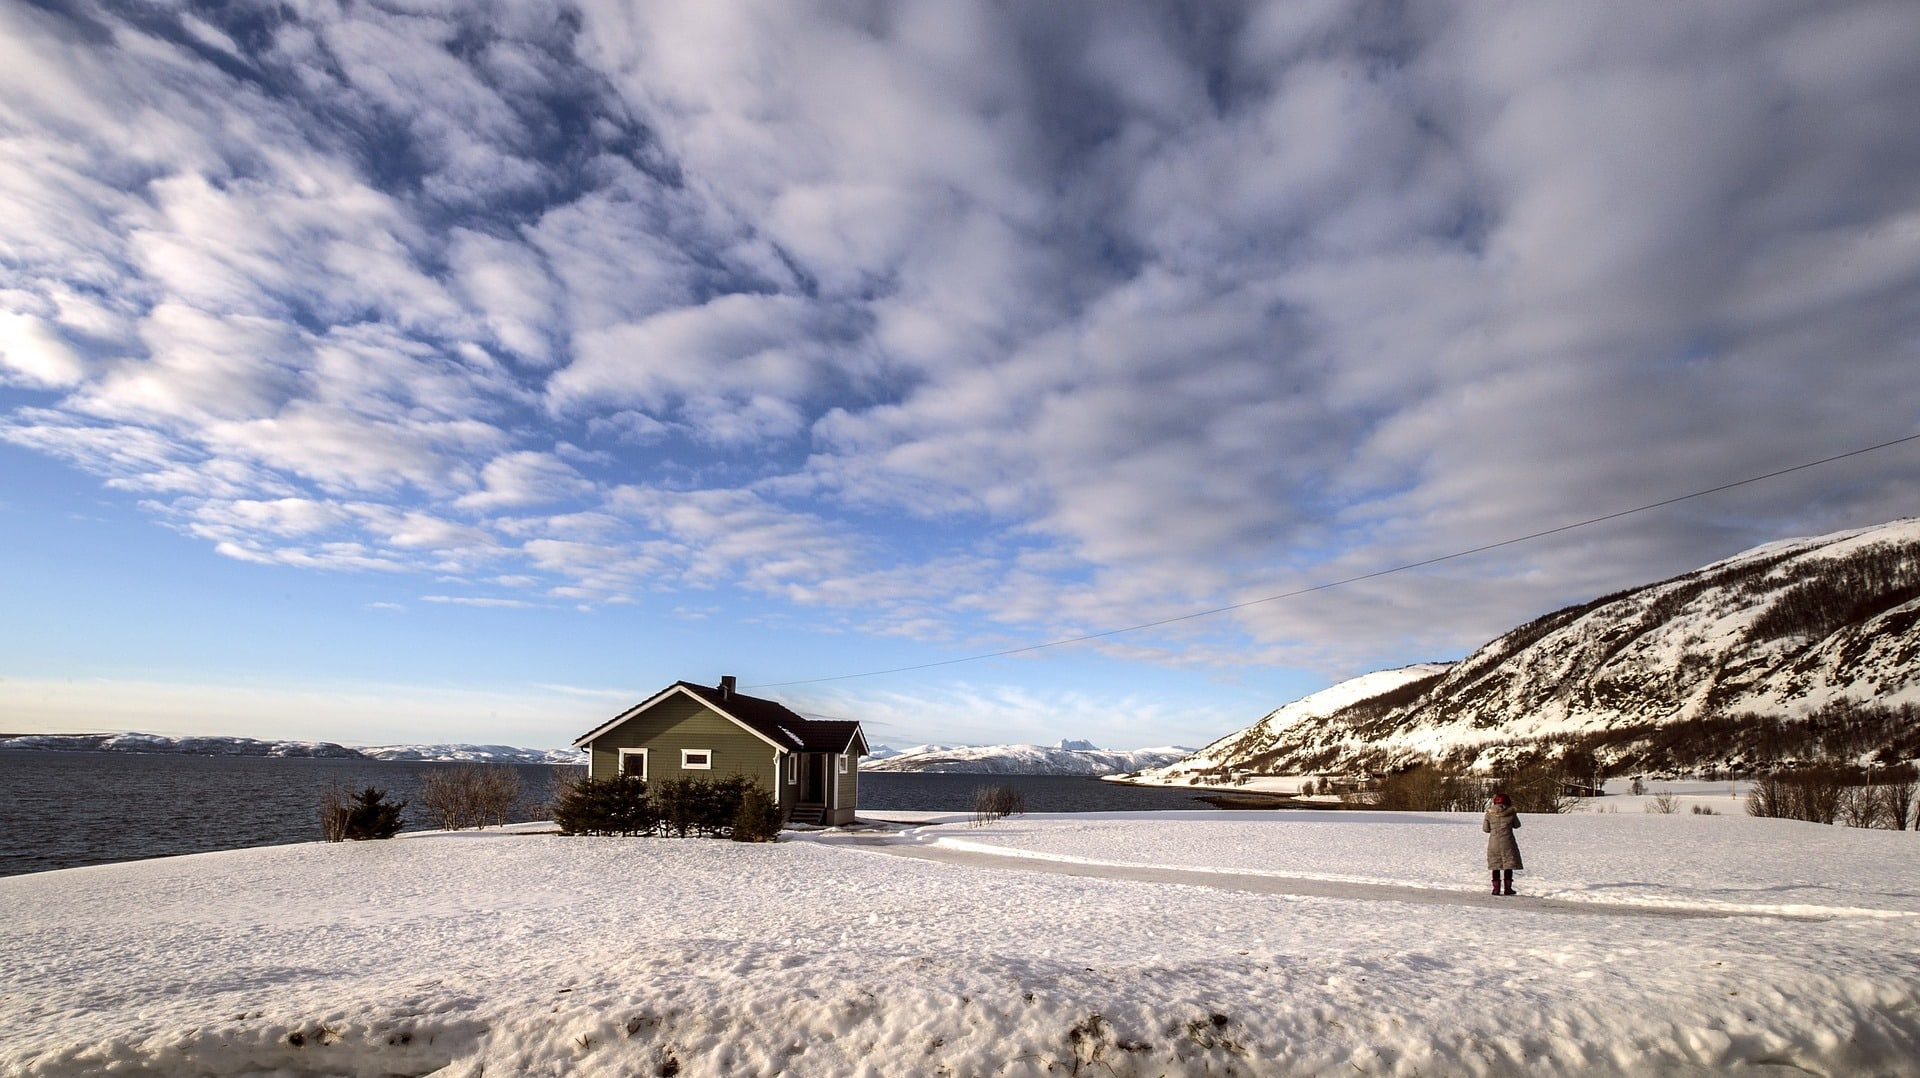 Islands Natur ist im Winter sehr rau.